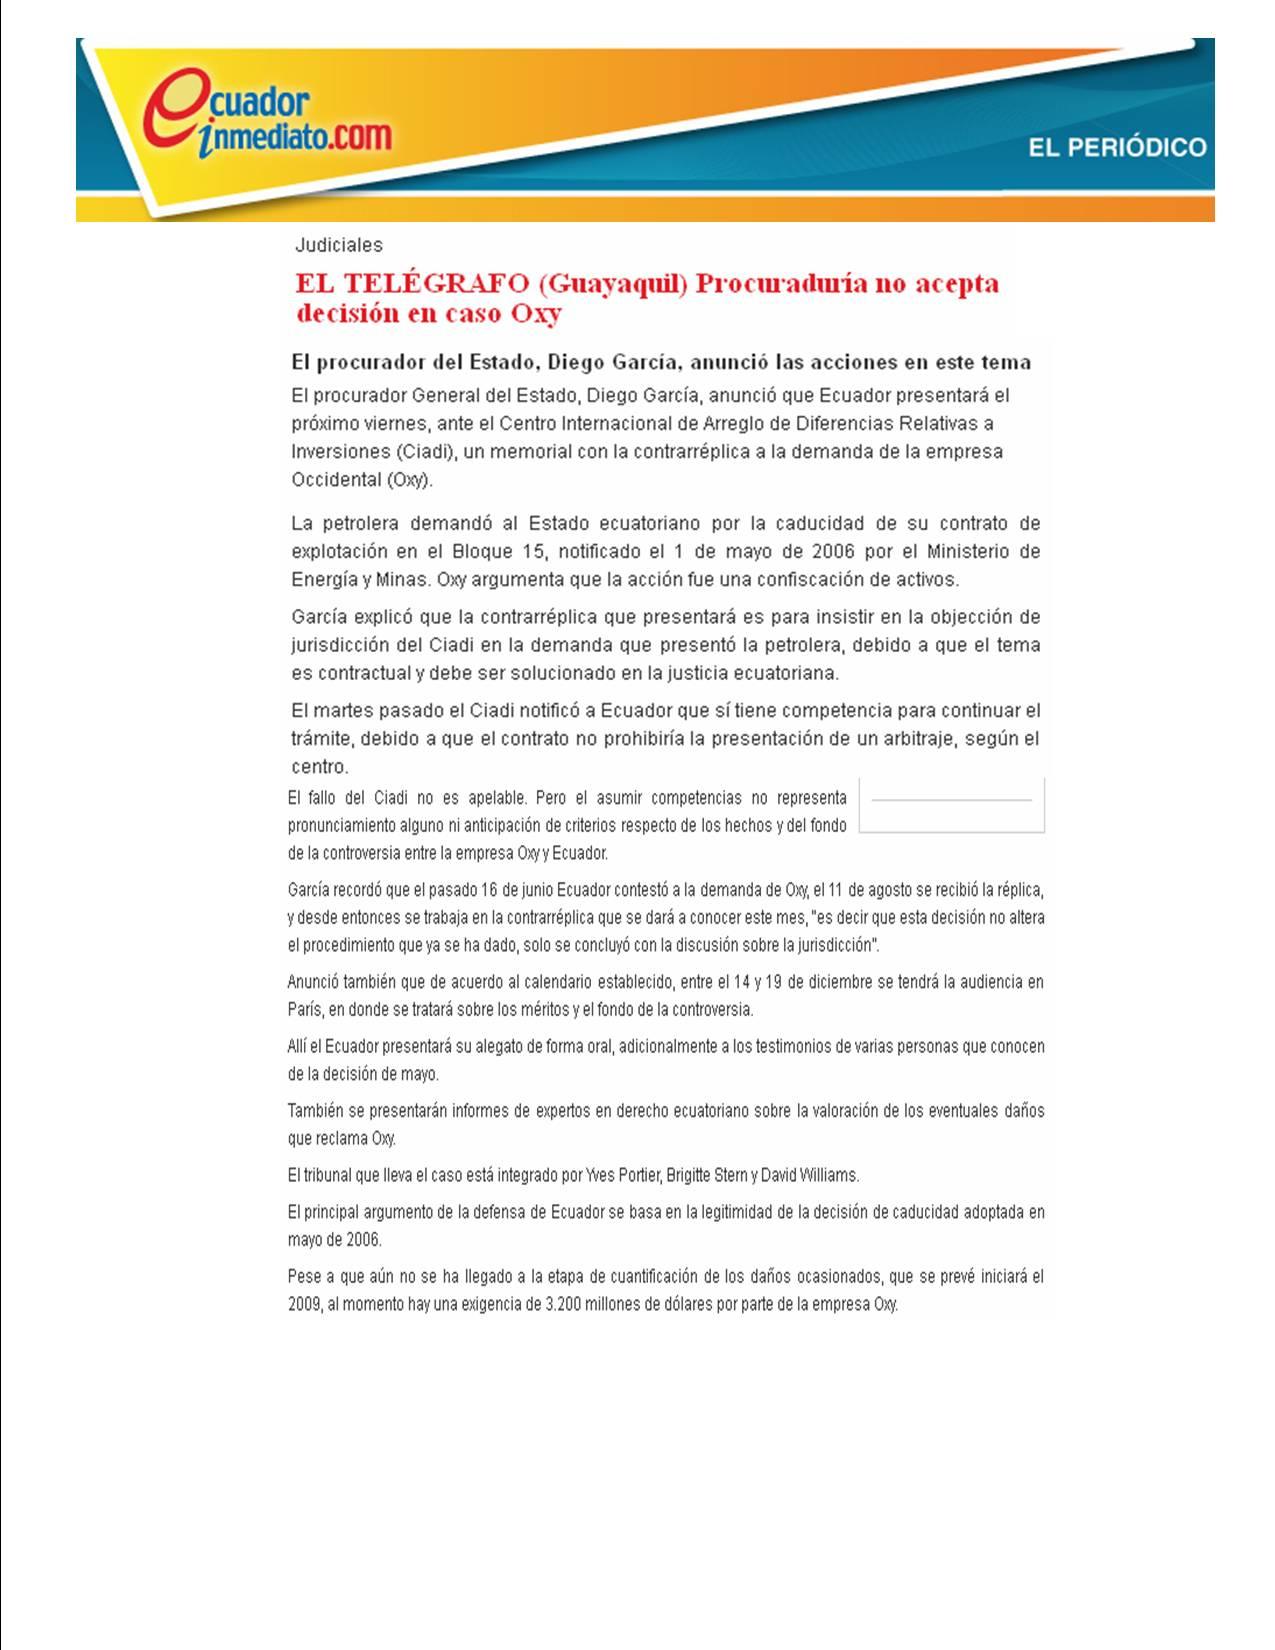 4-EL TELEGRAFO -ECUADOINMEDIATO.COM 11-09-2008